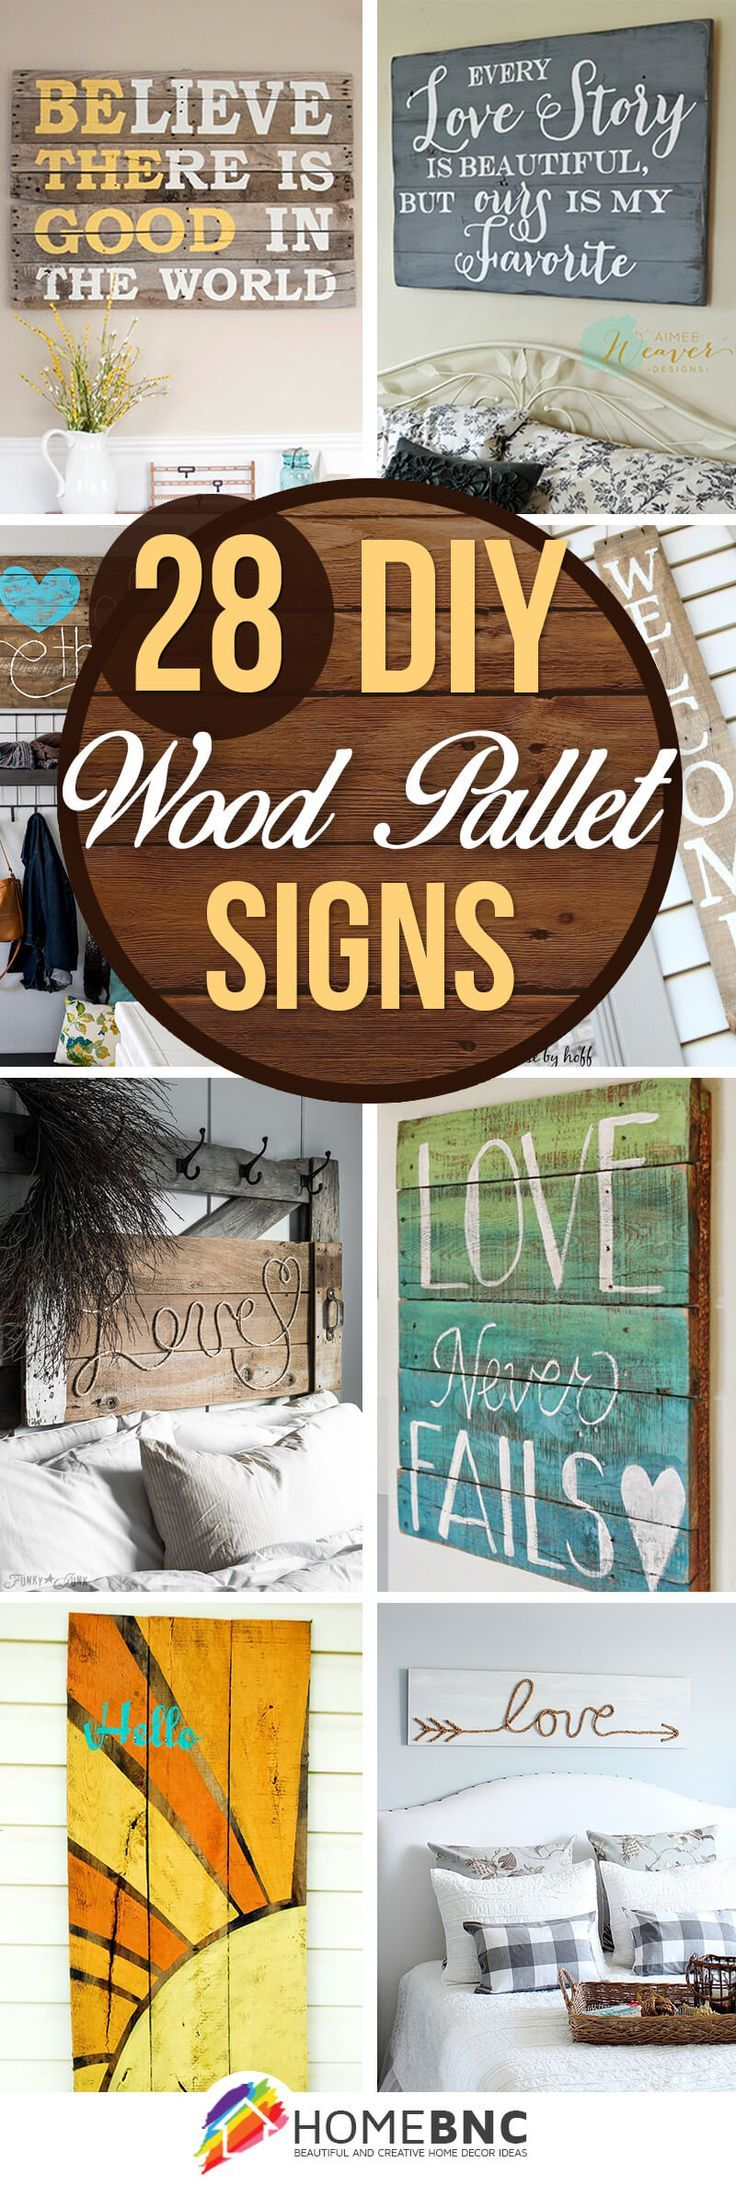 best 25 pallet signs ideas on pinterest pallet painting. Black Bedroom Furniture Sets. Home Design Ideas